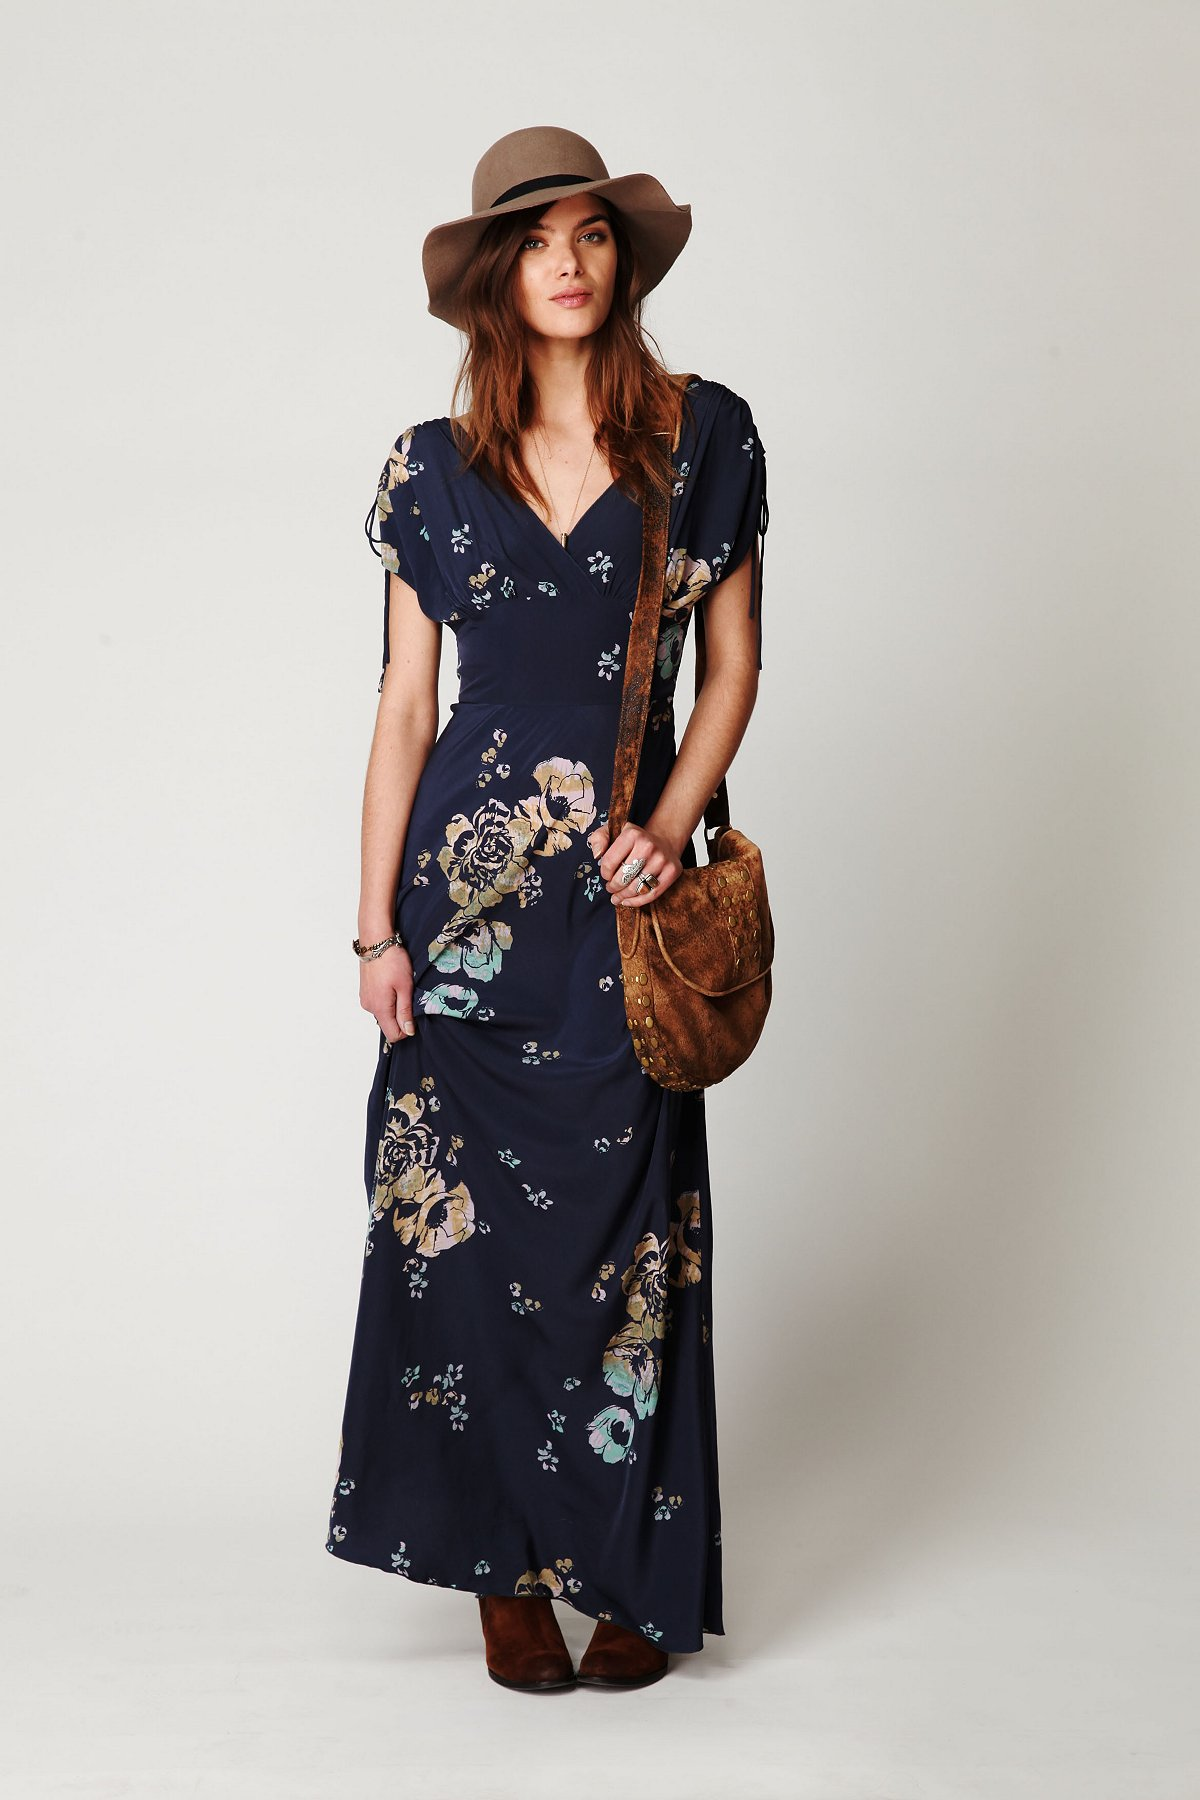 Short Sleeve Maxi Dress - Women's and Men Fashion